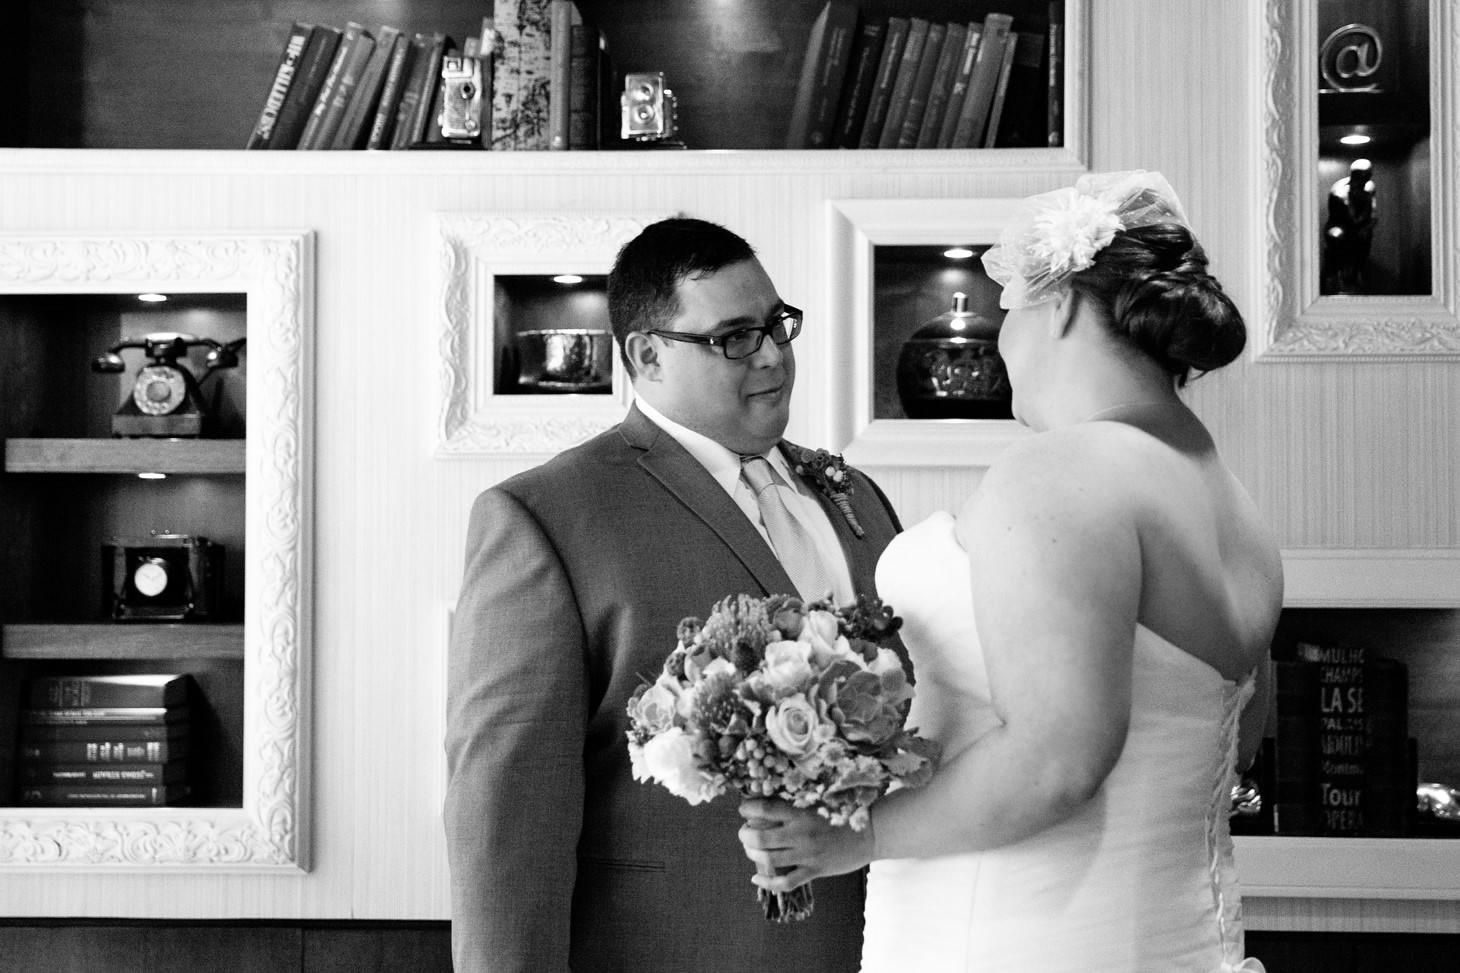 nyc-brooklyn-prospect-park-picnic-house-wedding-smitten-chickens-nerdy-22.jpg